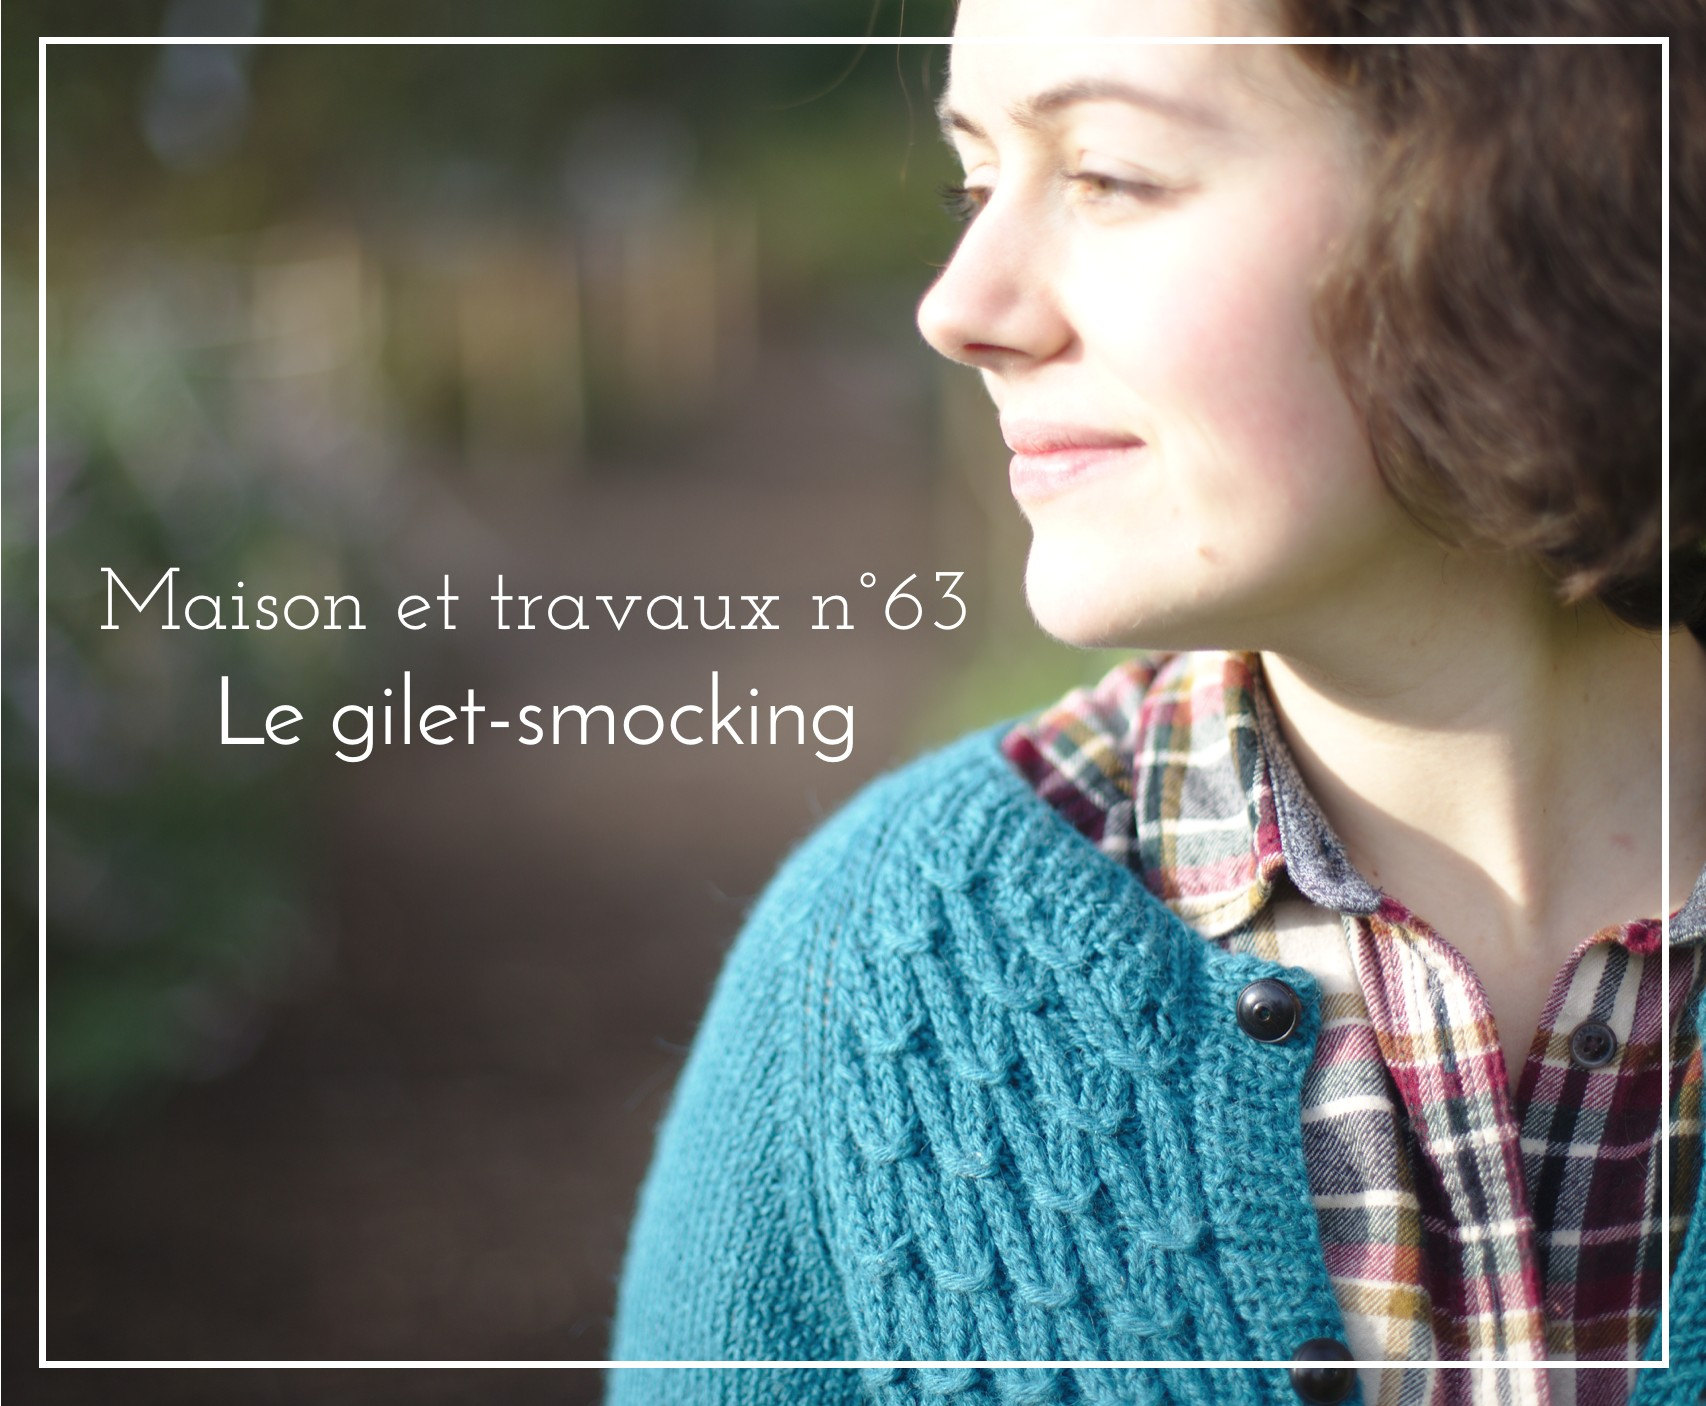 La muse au placard - classic smocking cardigan - Petite knit